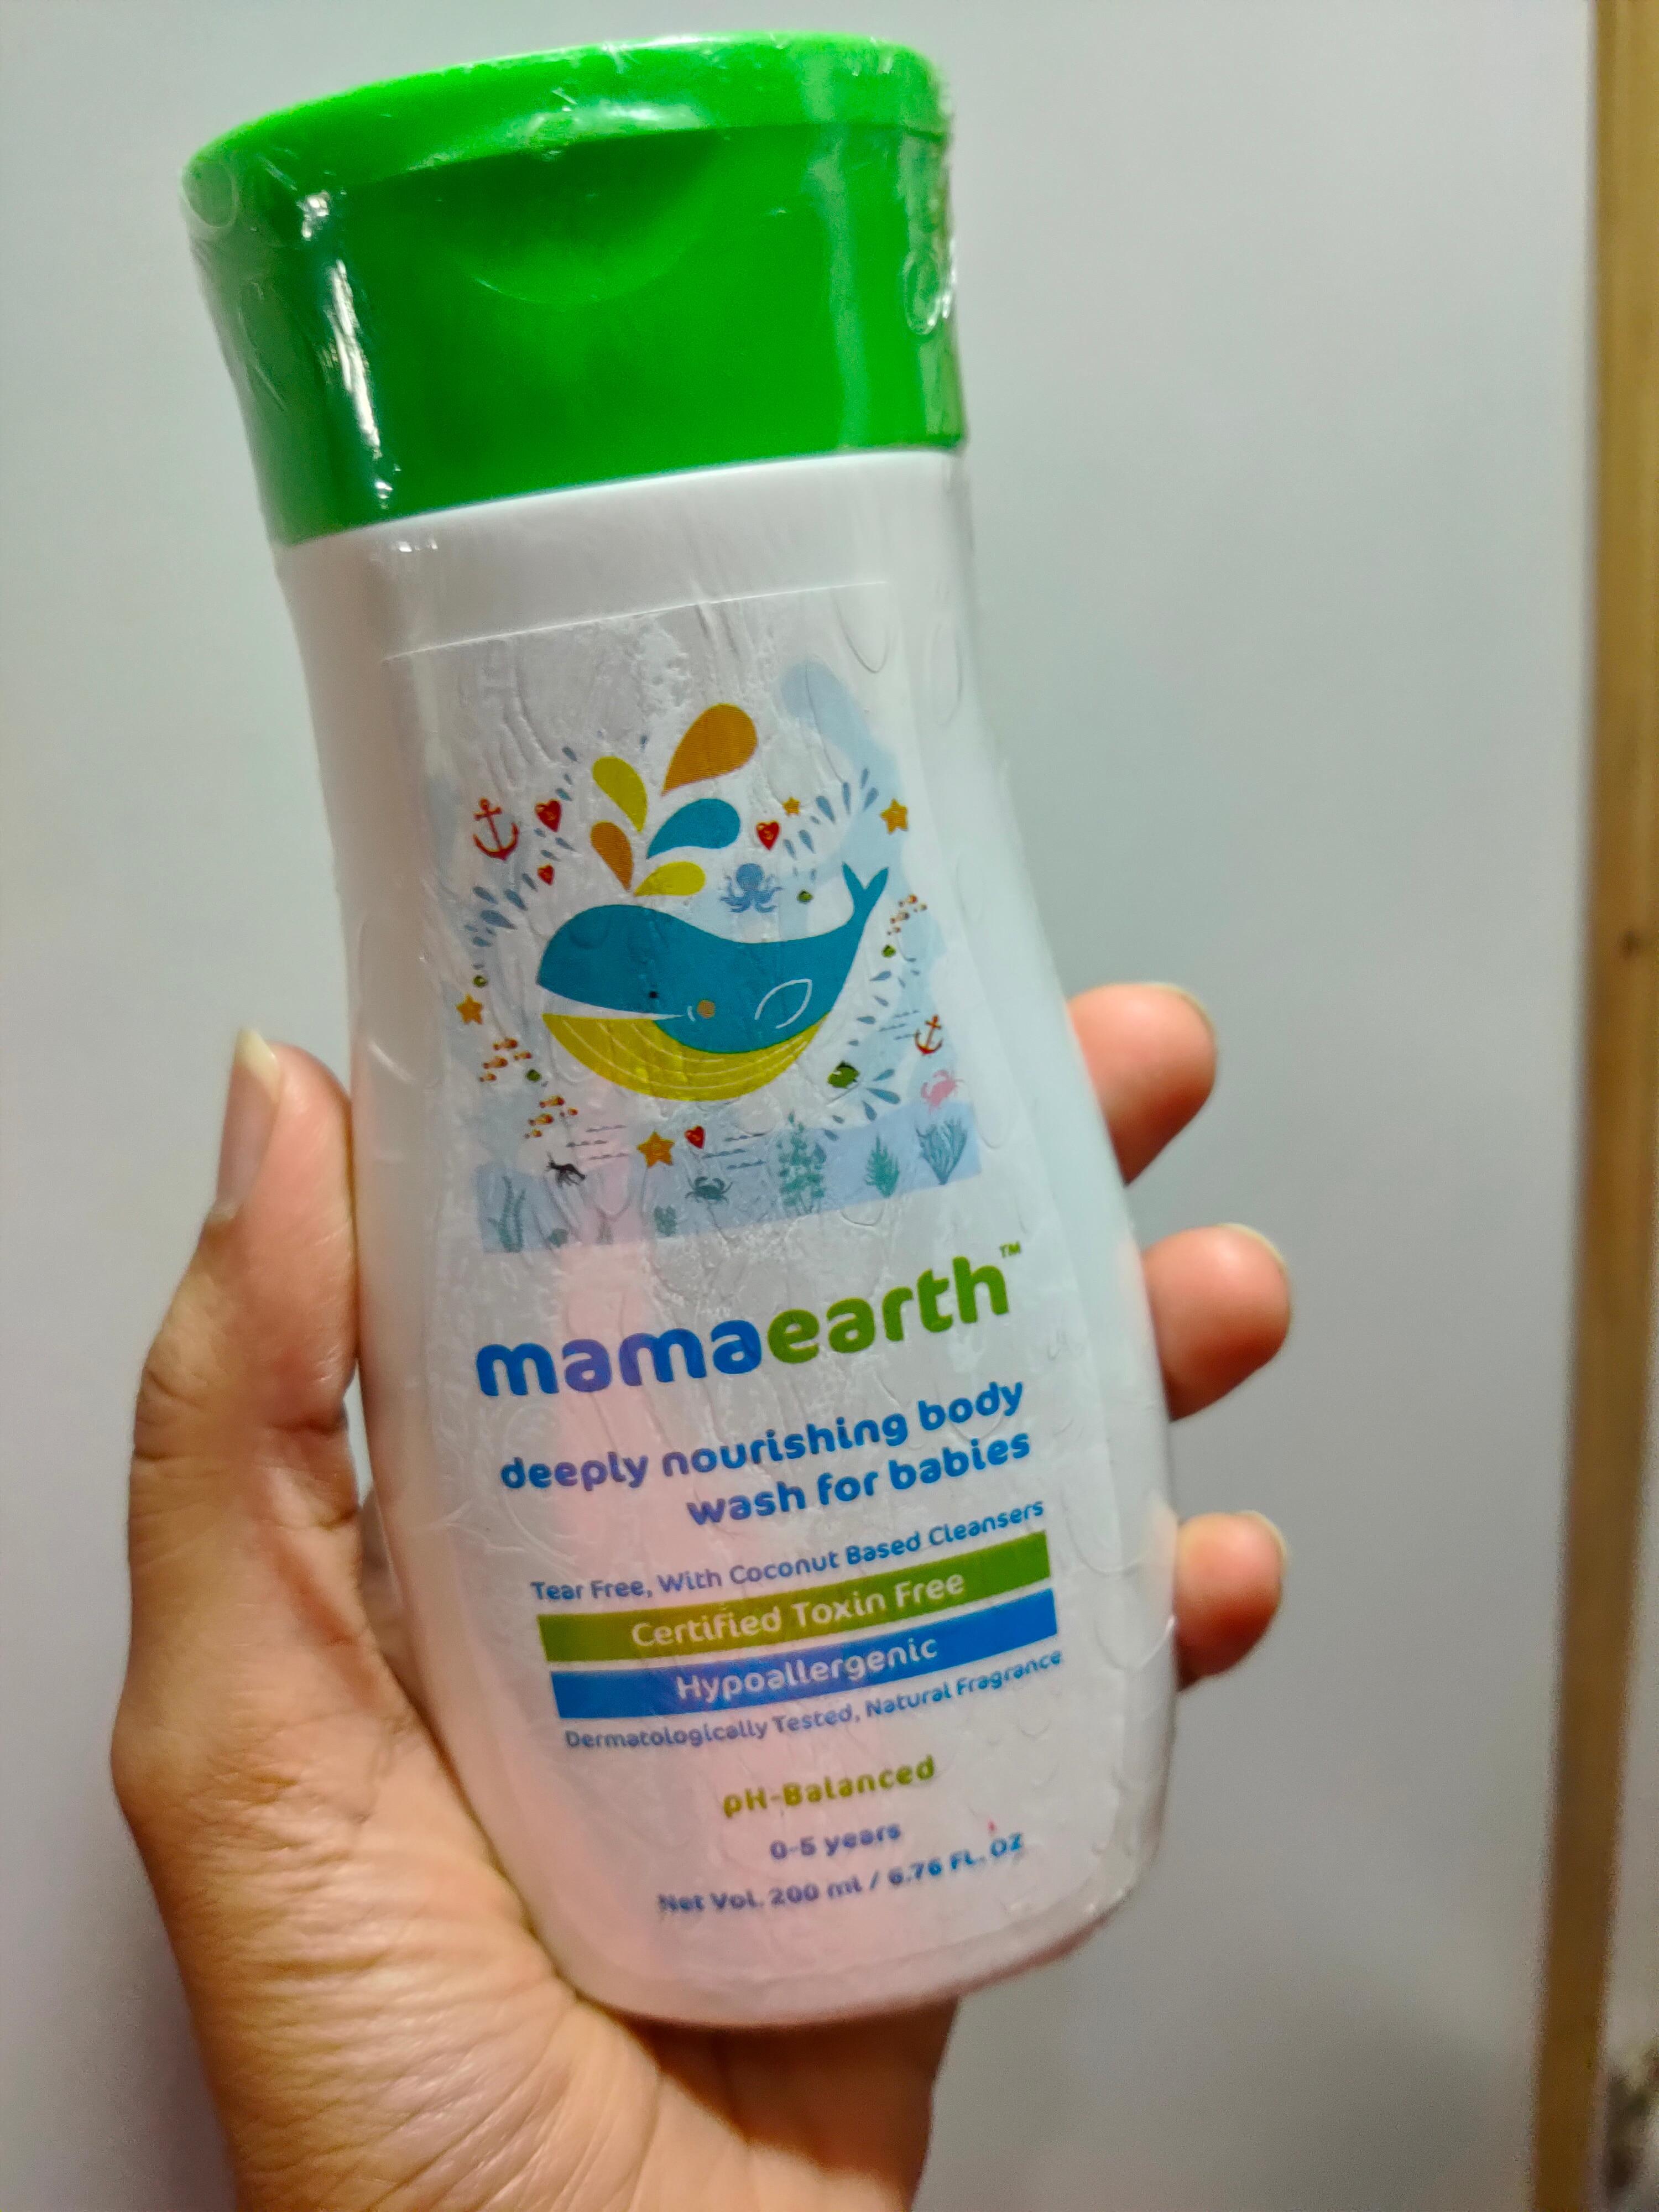 Mamaearth Deeply nourishing wash for babies-Mild for skin-By madaanritu